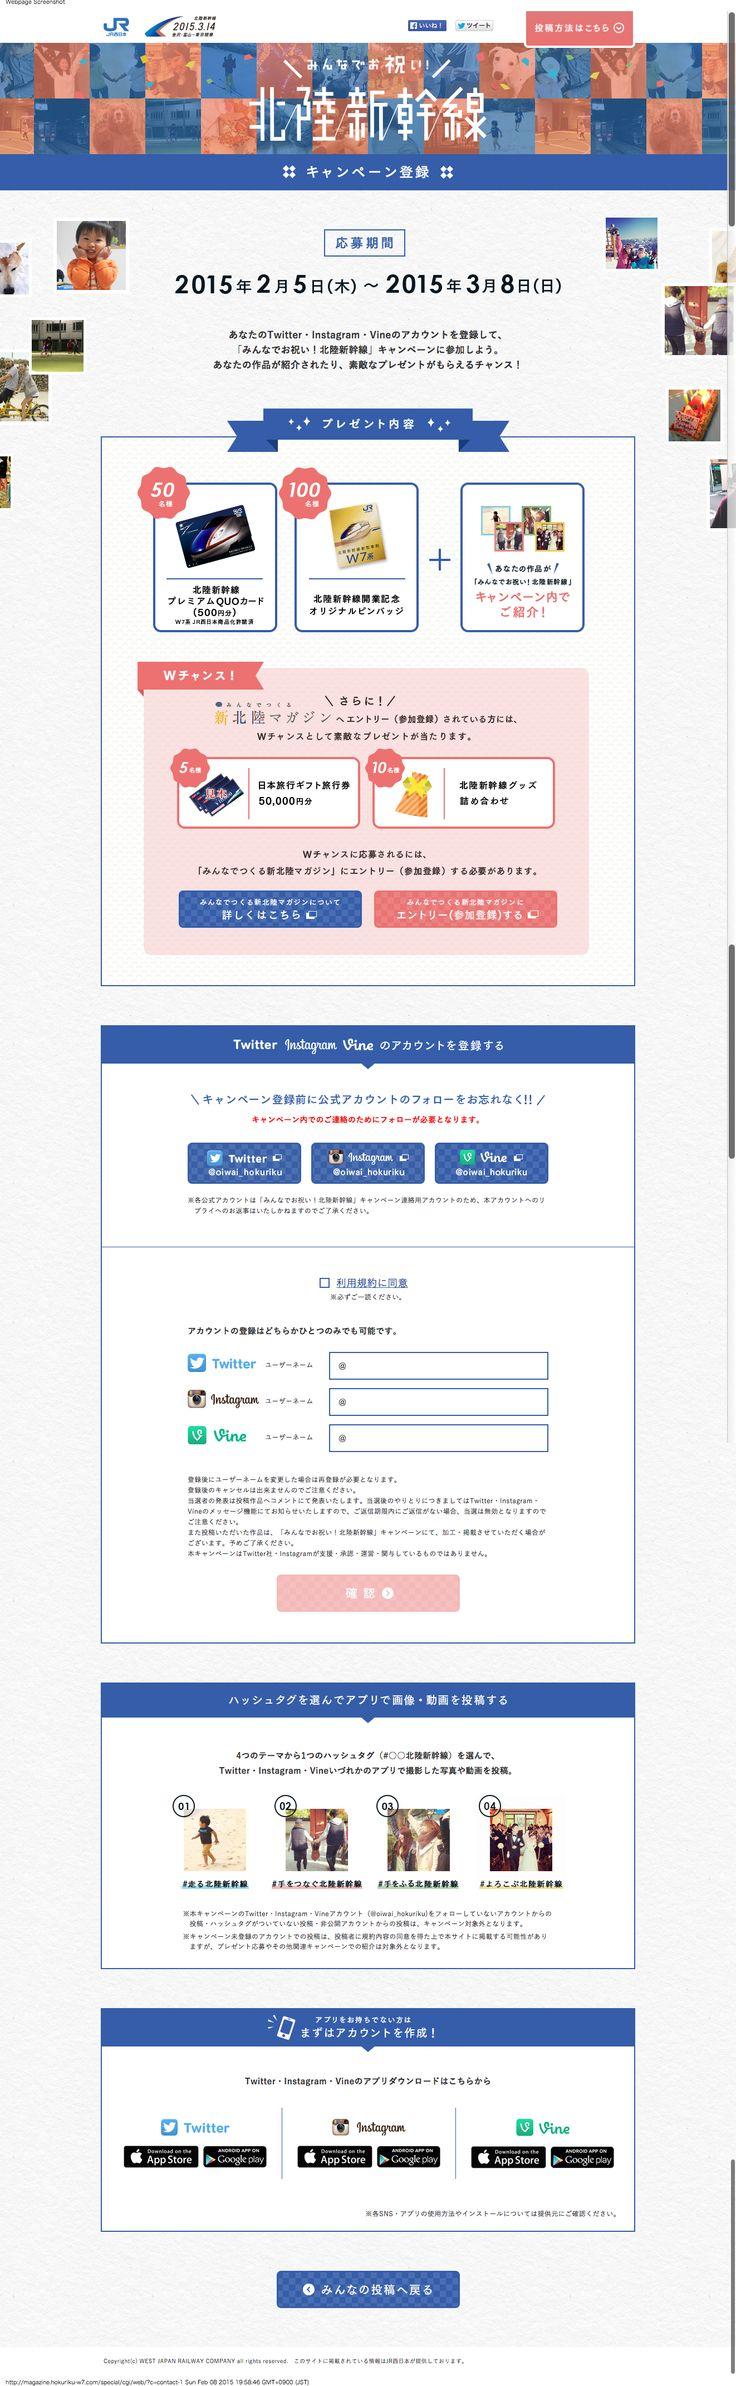 http://magazine.hokuriku-w7.com/special/cgi/web/?c=contact-1 キャンペーン登録 | みんなでお祝い!北陸新幹線キャンペーン